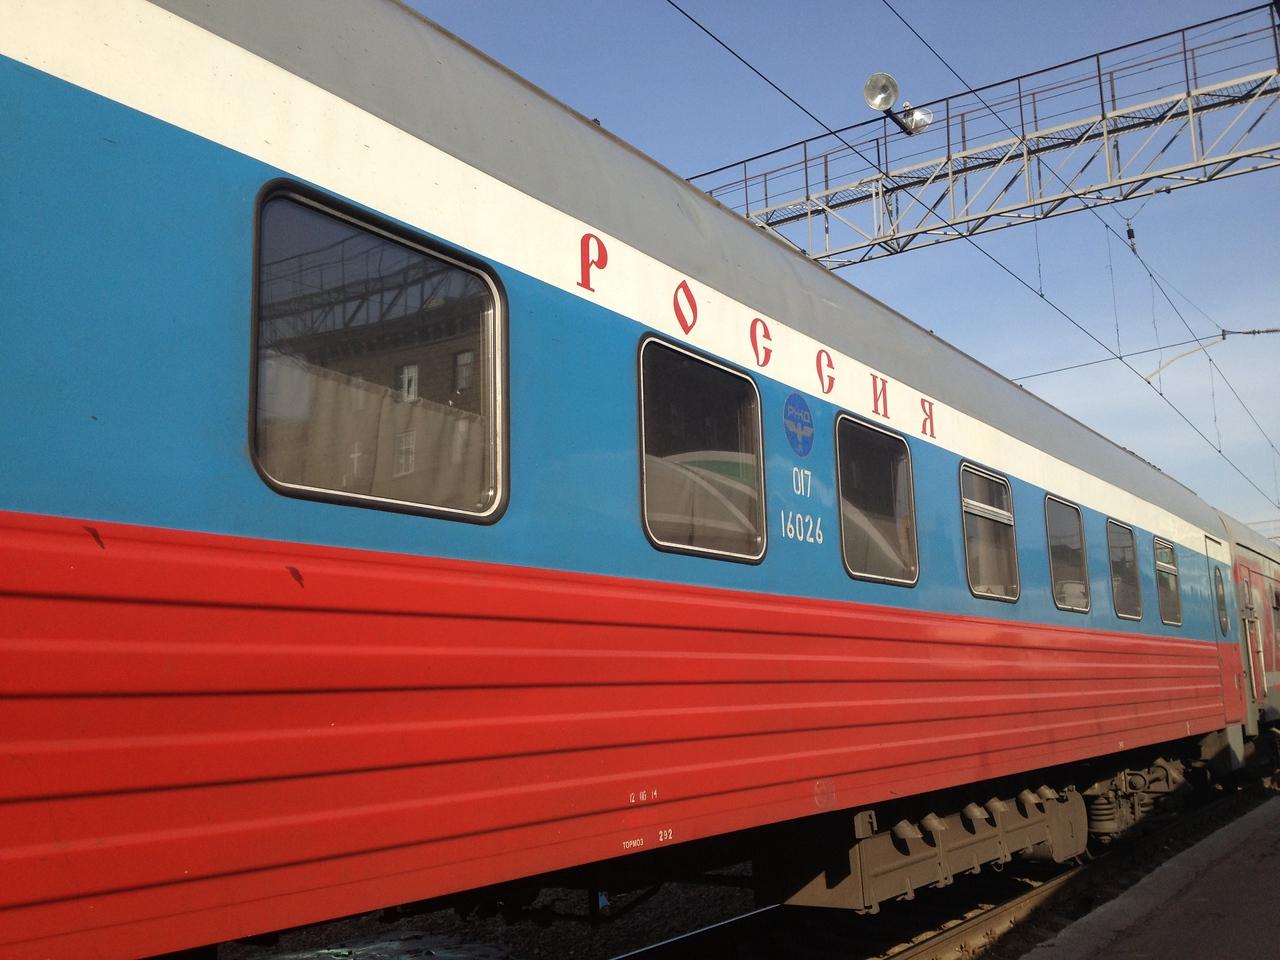 Trans-Siberian train: Rossiya 1